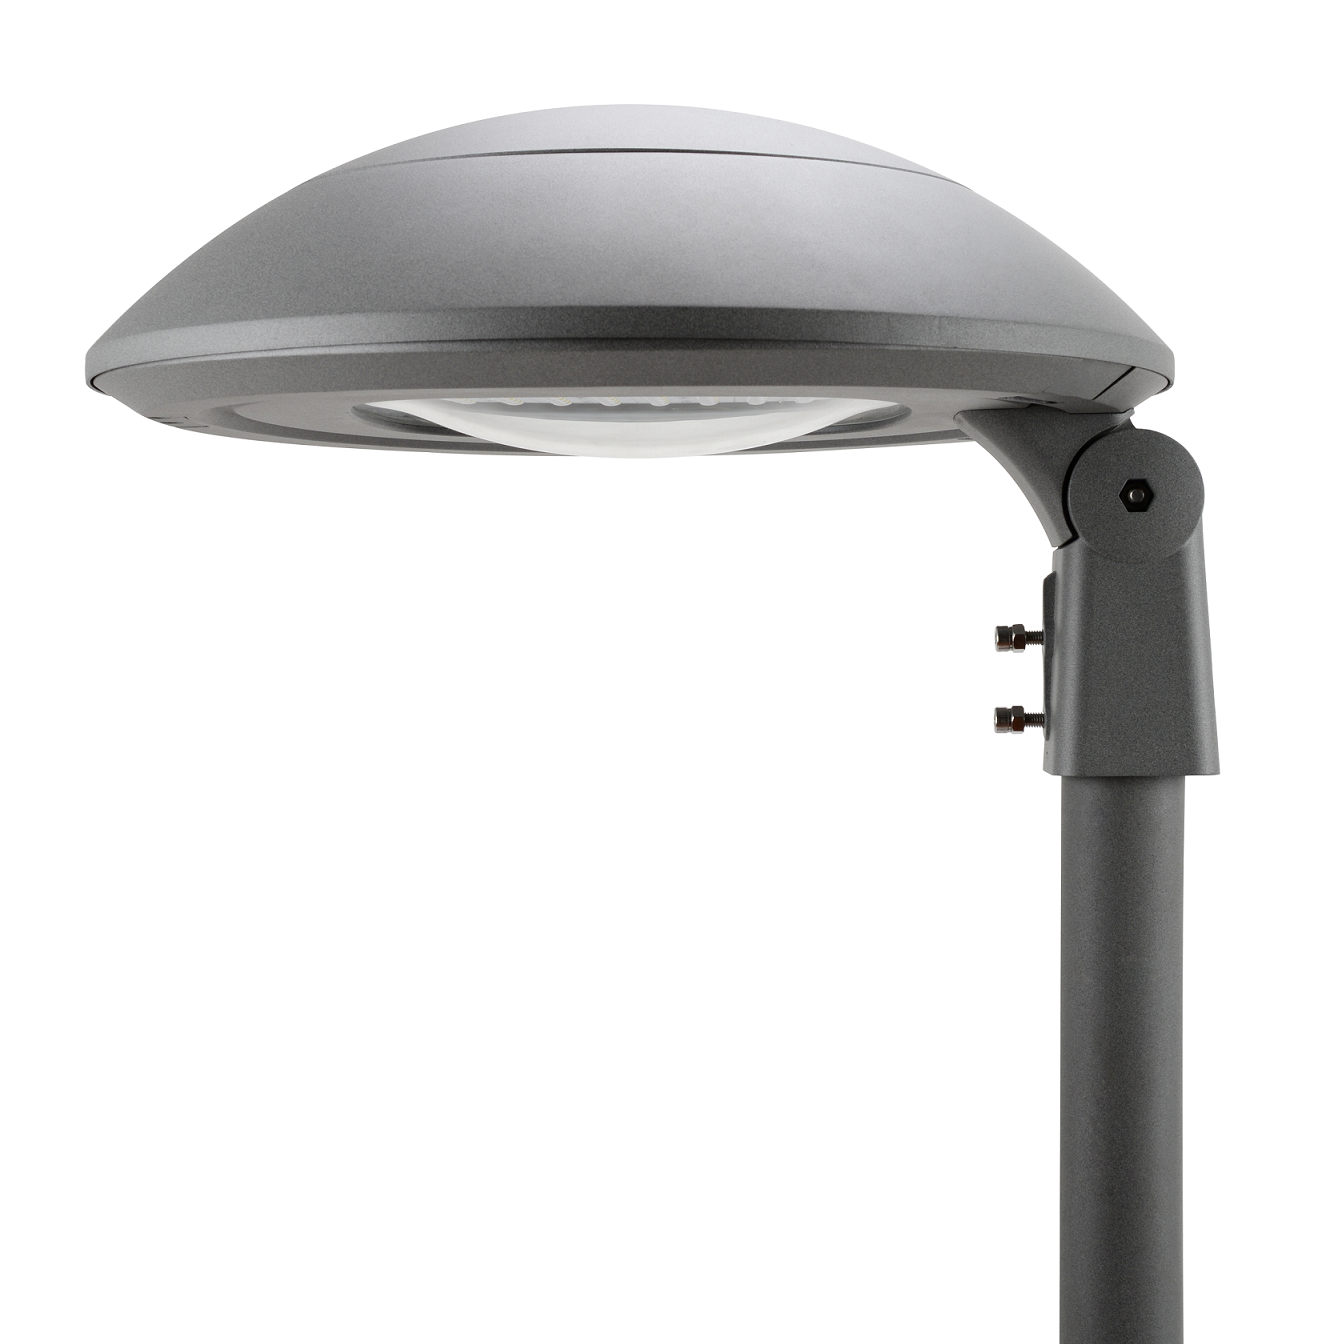 LED STNB Series